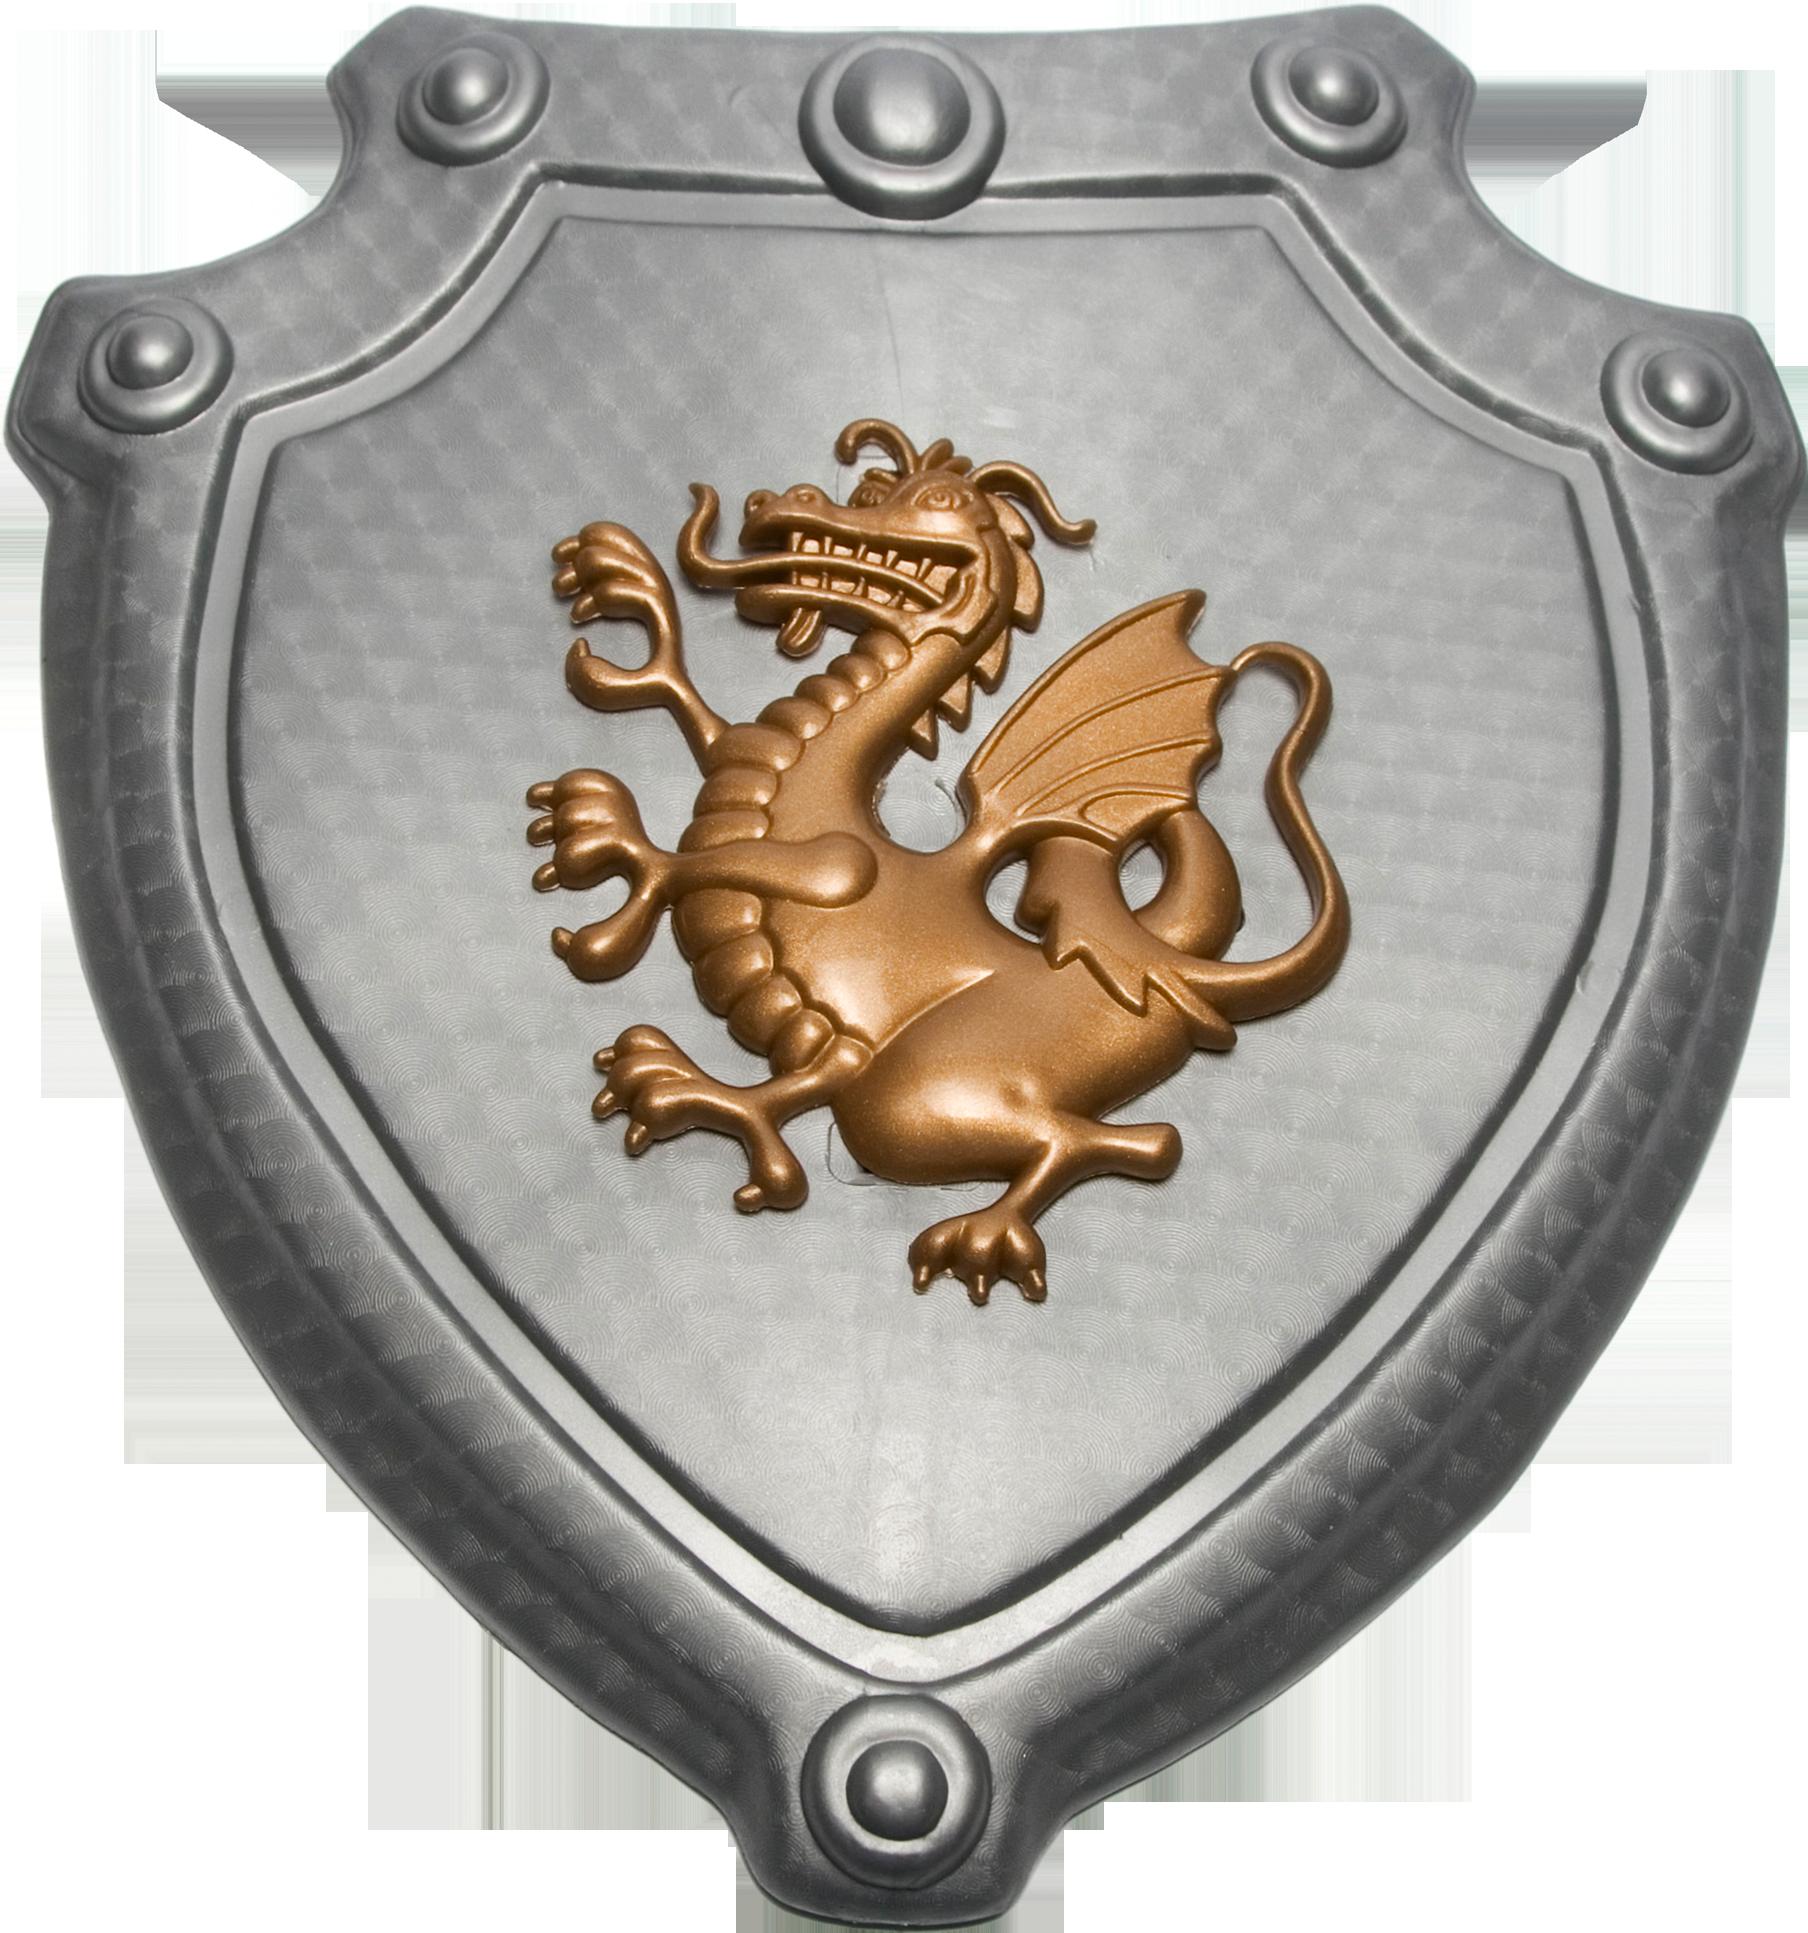 Shield HD PNG - 118034